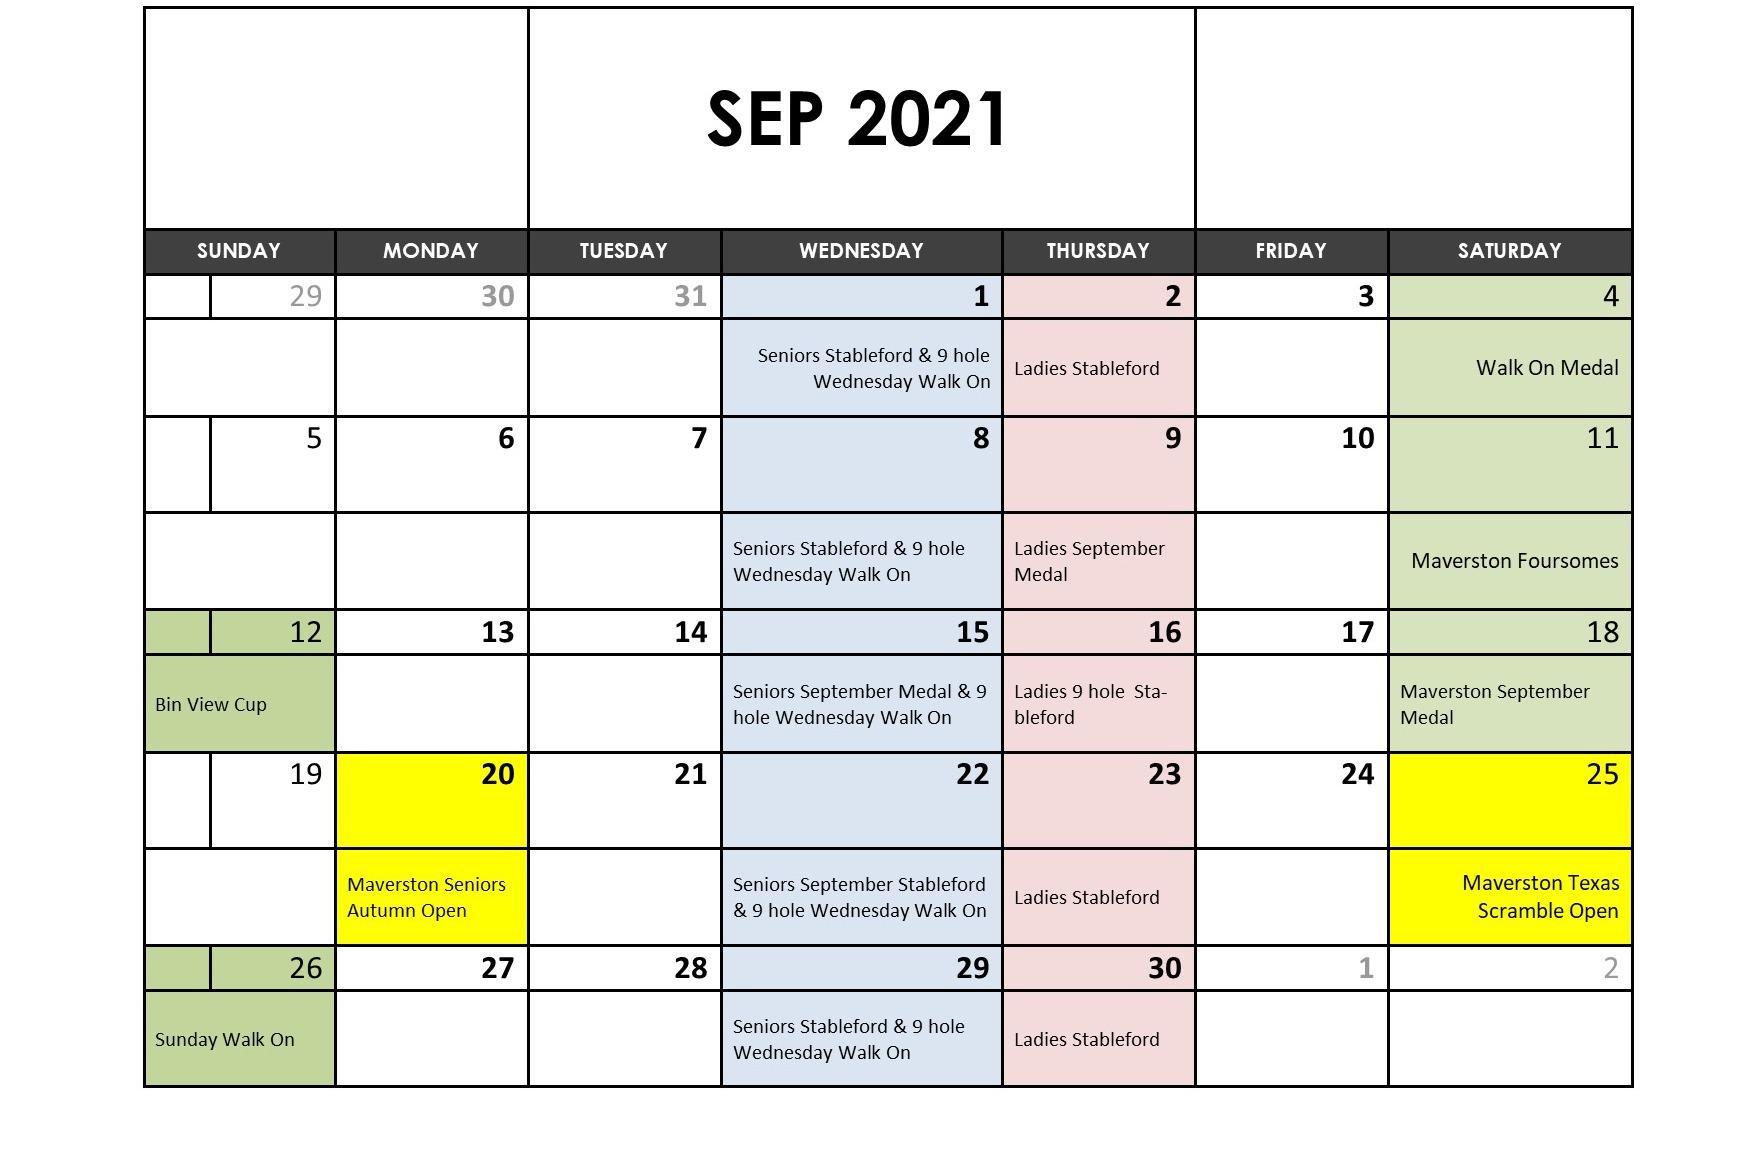 September 2021 Fixtures